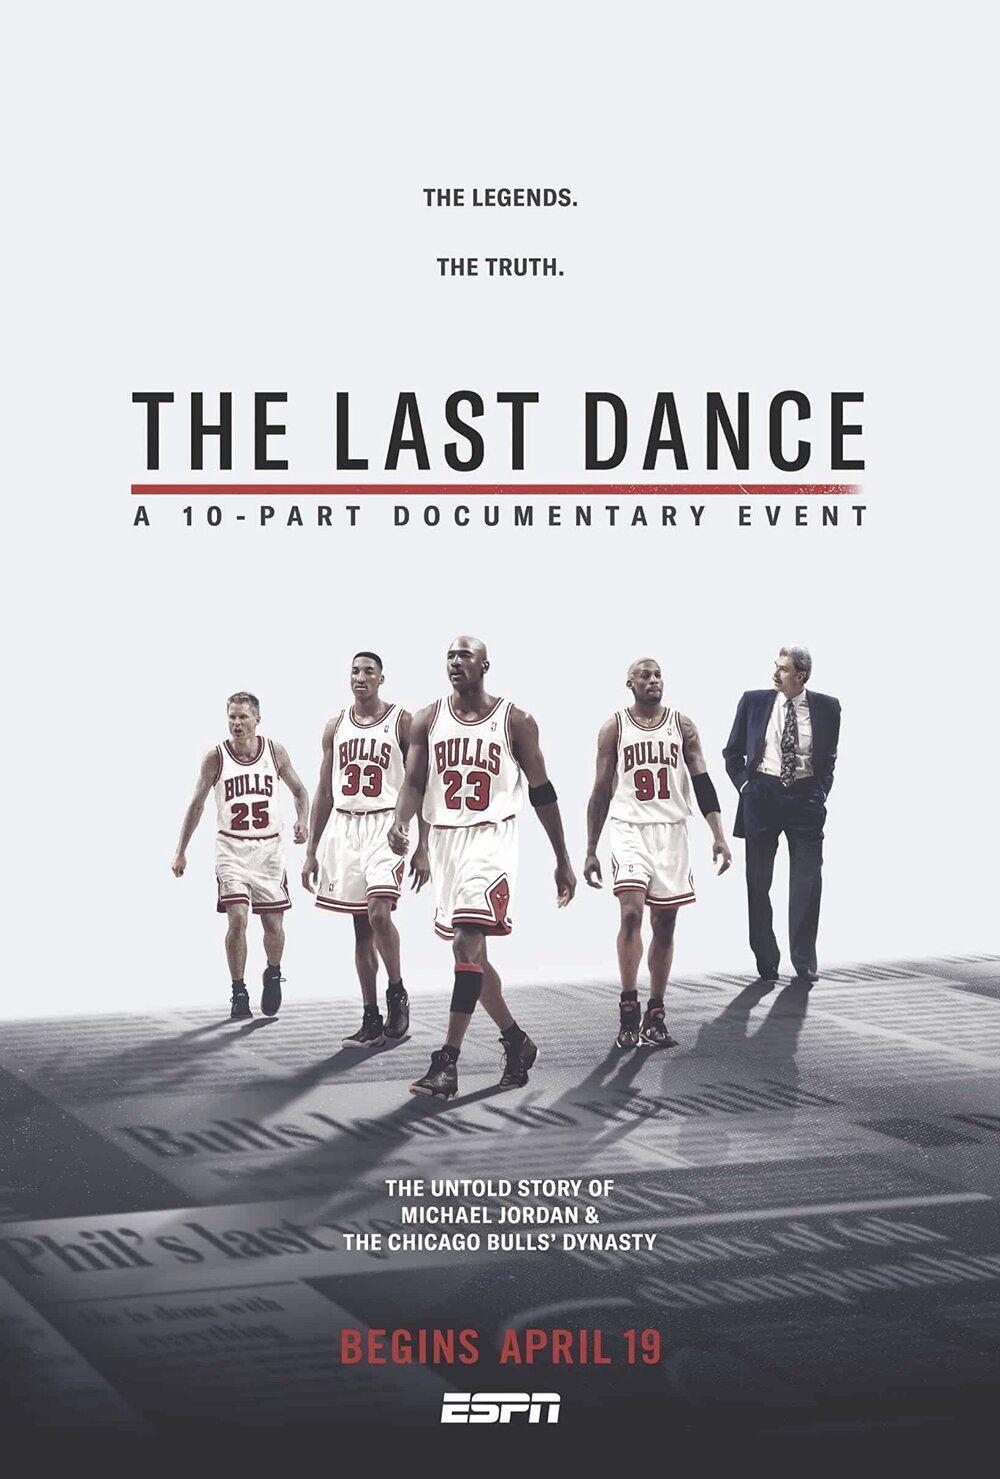 Thelastdance Michaeljordan Espn Espn Last Dance Kids Family Movies Netflix Documentaries